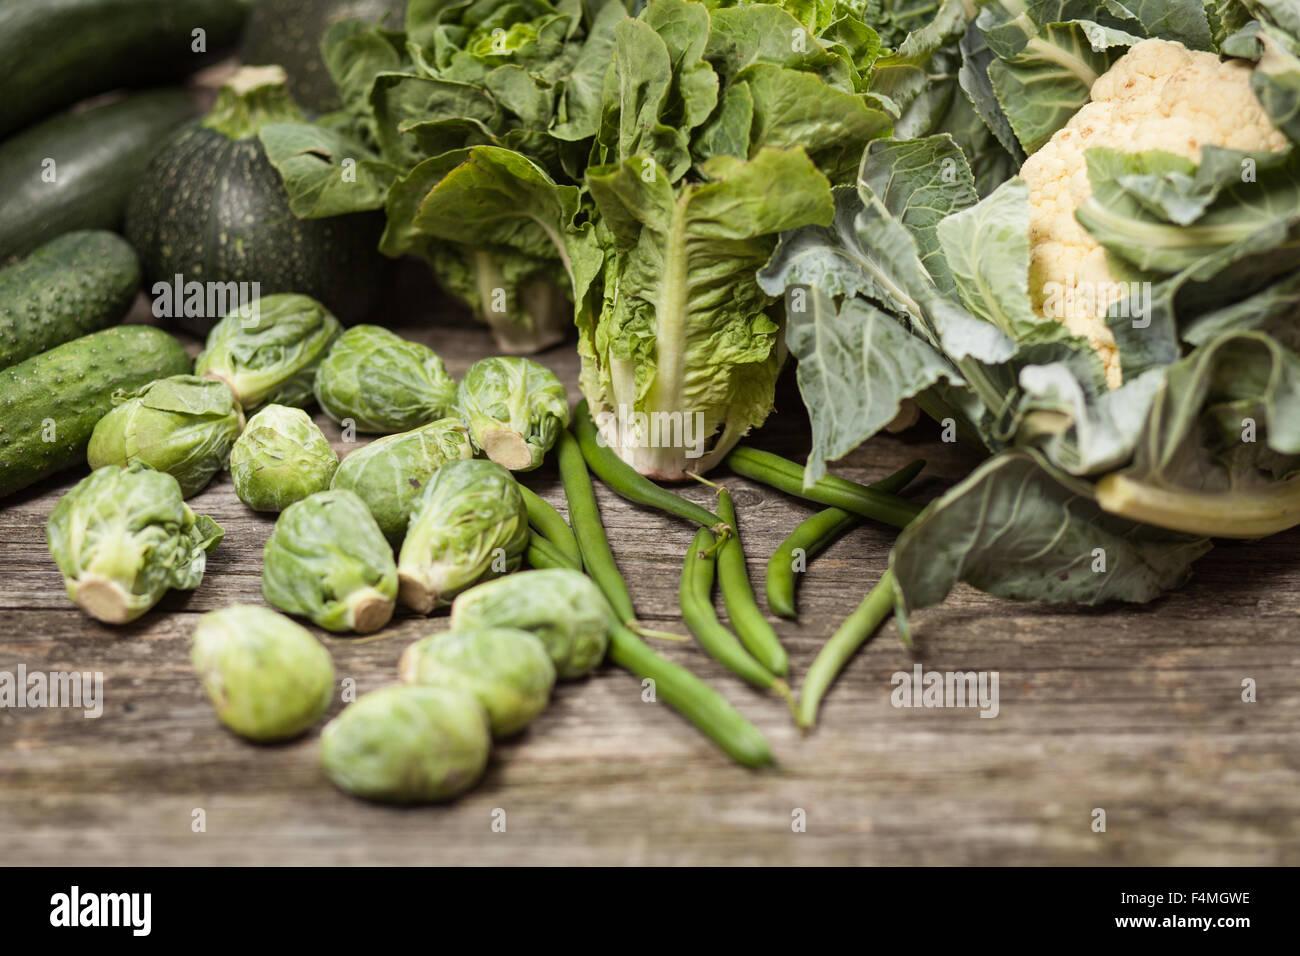 Assortment of green vegetables - Stock Image